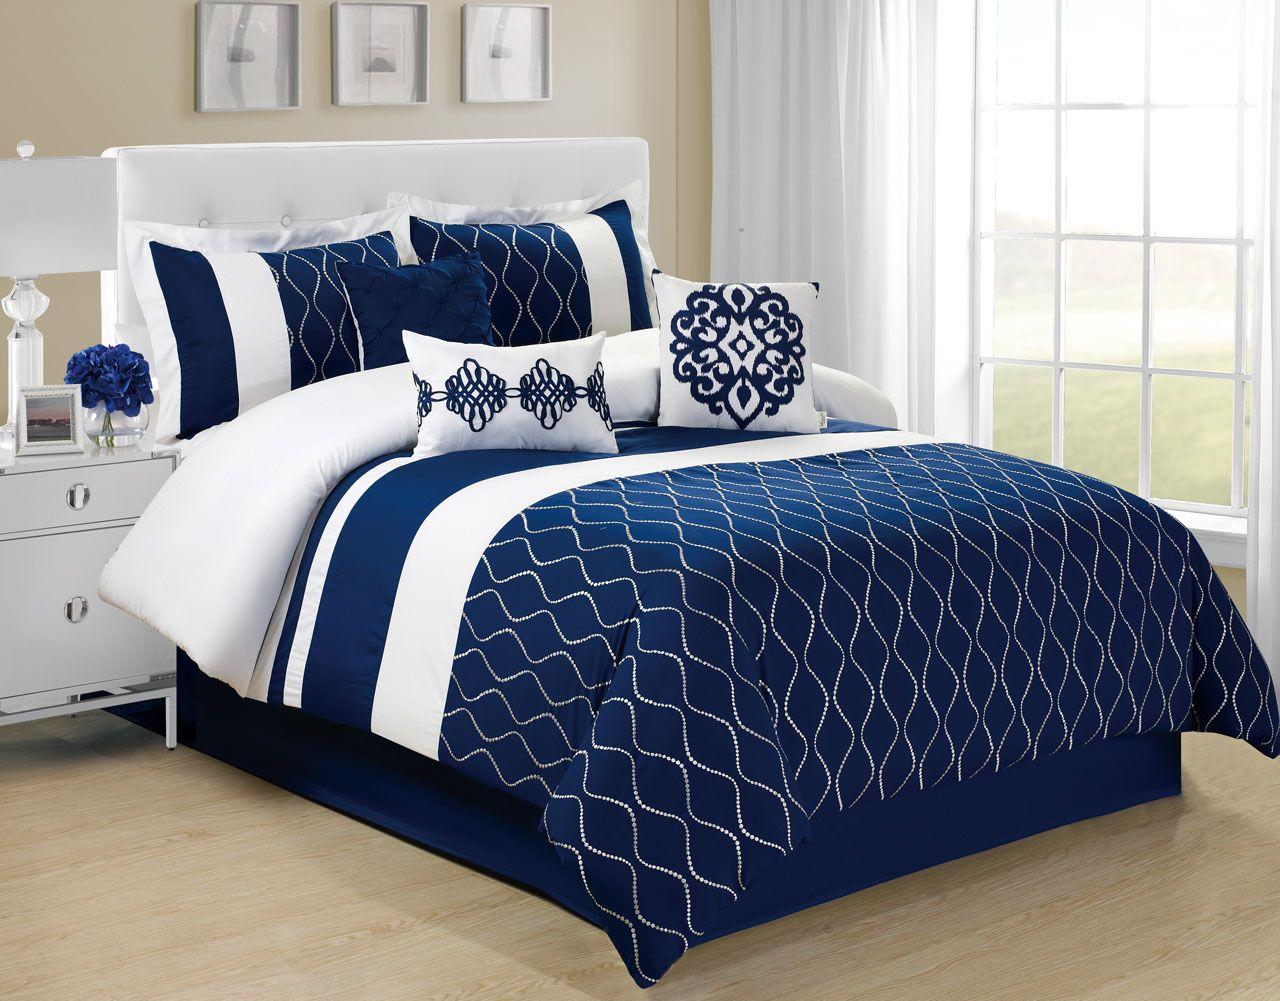 7 Piece Malibu Navy/White Comforter Set | comforters | Pinterest ...